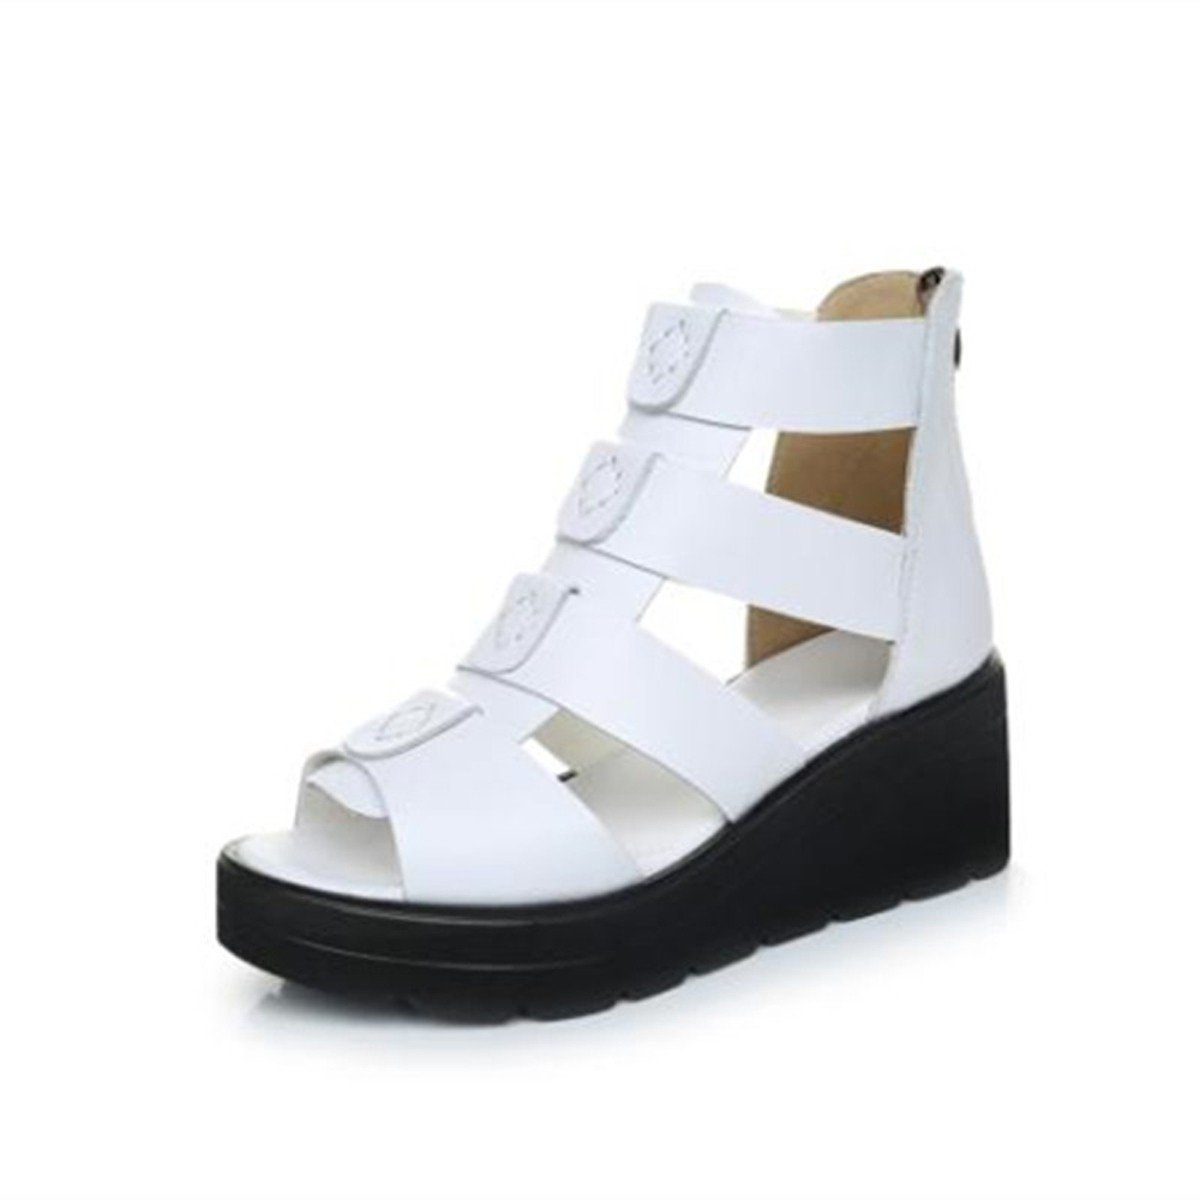 GTVERNH Zapatos de Mujer/Boca De Pez De Fondo Grueso De Verano Corto Botas Sandalias Y Sandalias Bizcocho Pescado Blanco Boca Hollow Botas.Cuarenta Blanco Forty|white